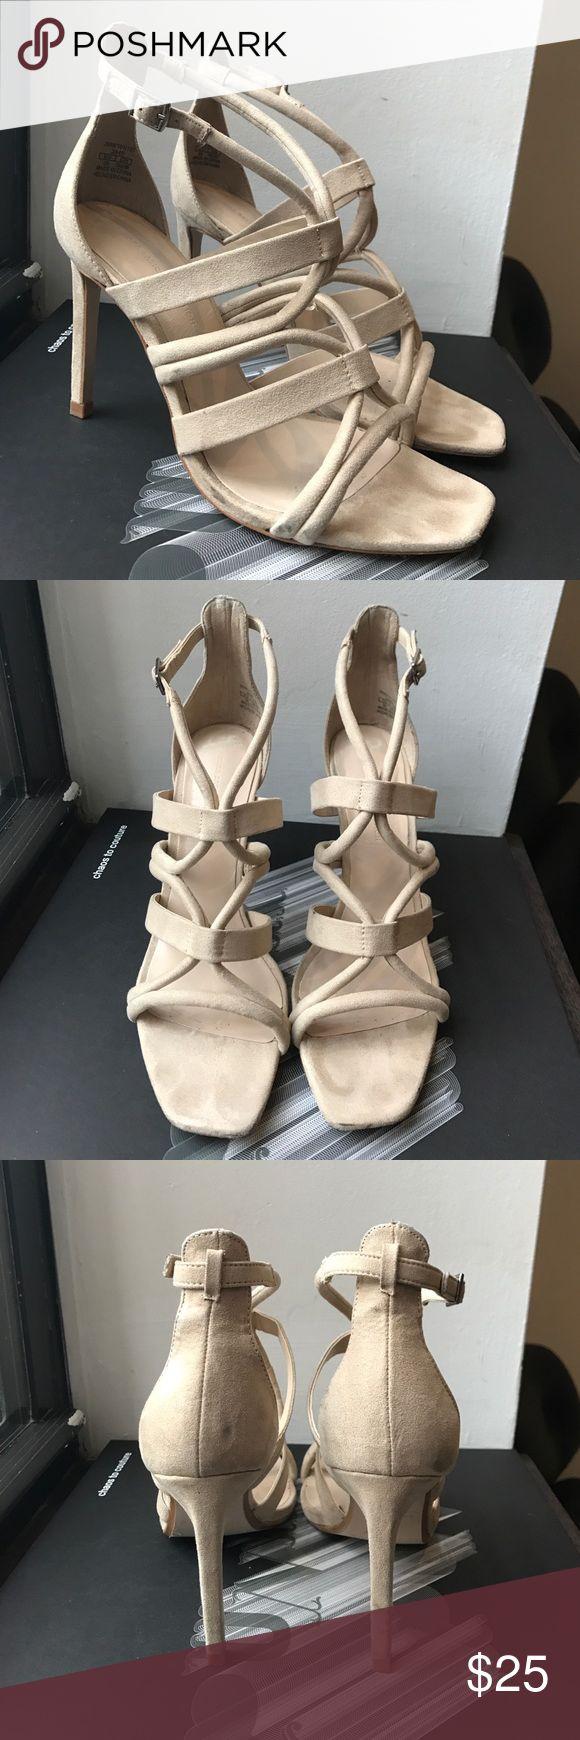 Cream high heel strappy sandal. Faux suede. Zara Cream high heel strappy stiletto sandal.  Brand Zara.  Worn one time.  Zara, Nasty Gal, Revolve, Shop Bop, ASOS, Nordstrom, Zara Shoes Heels